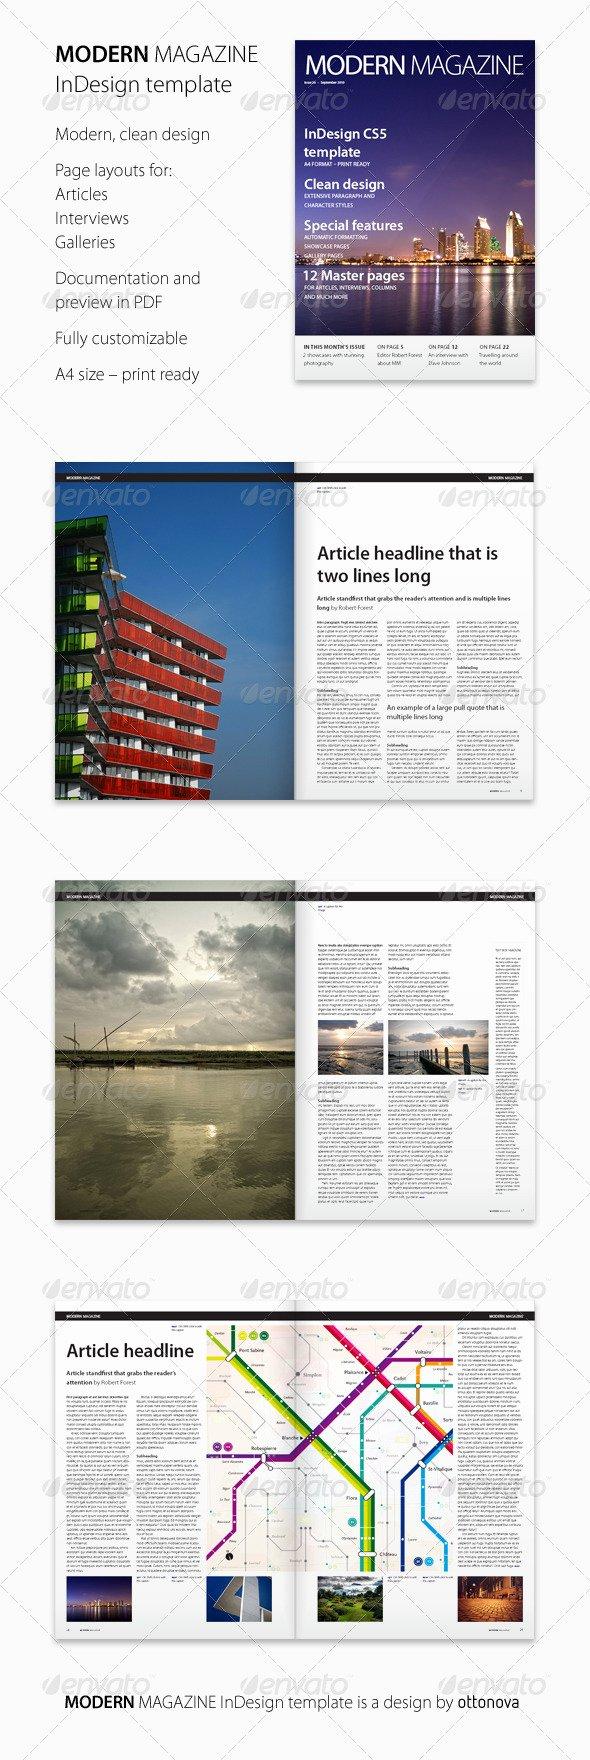 Modern Magazine Indesign Template